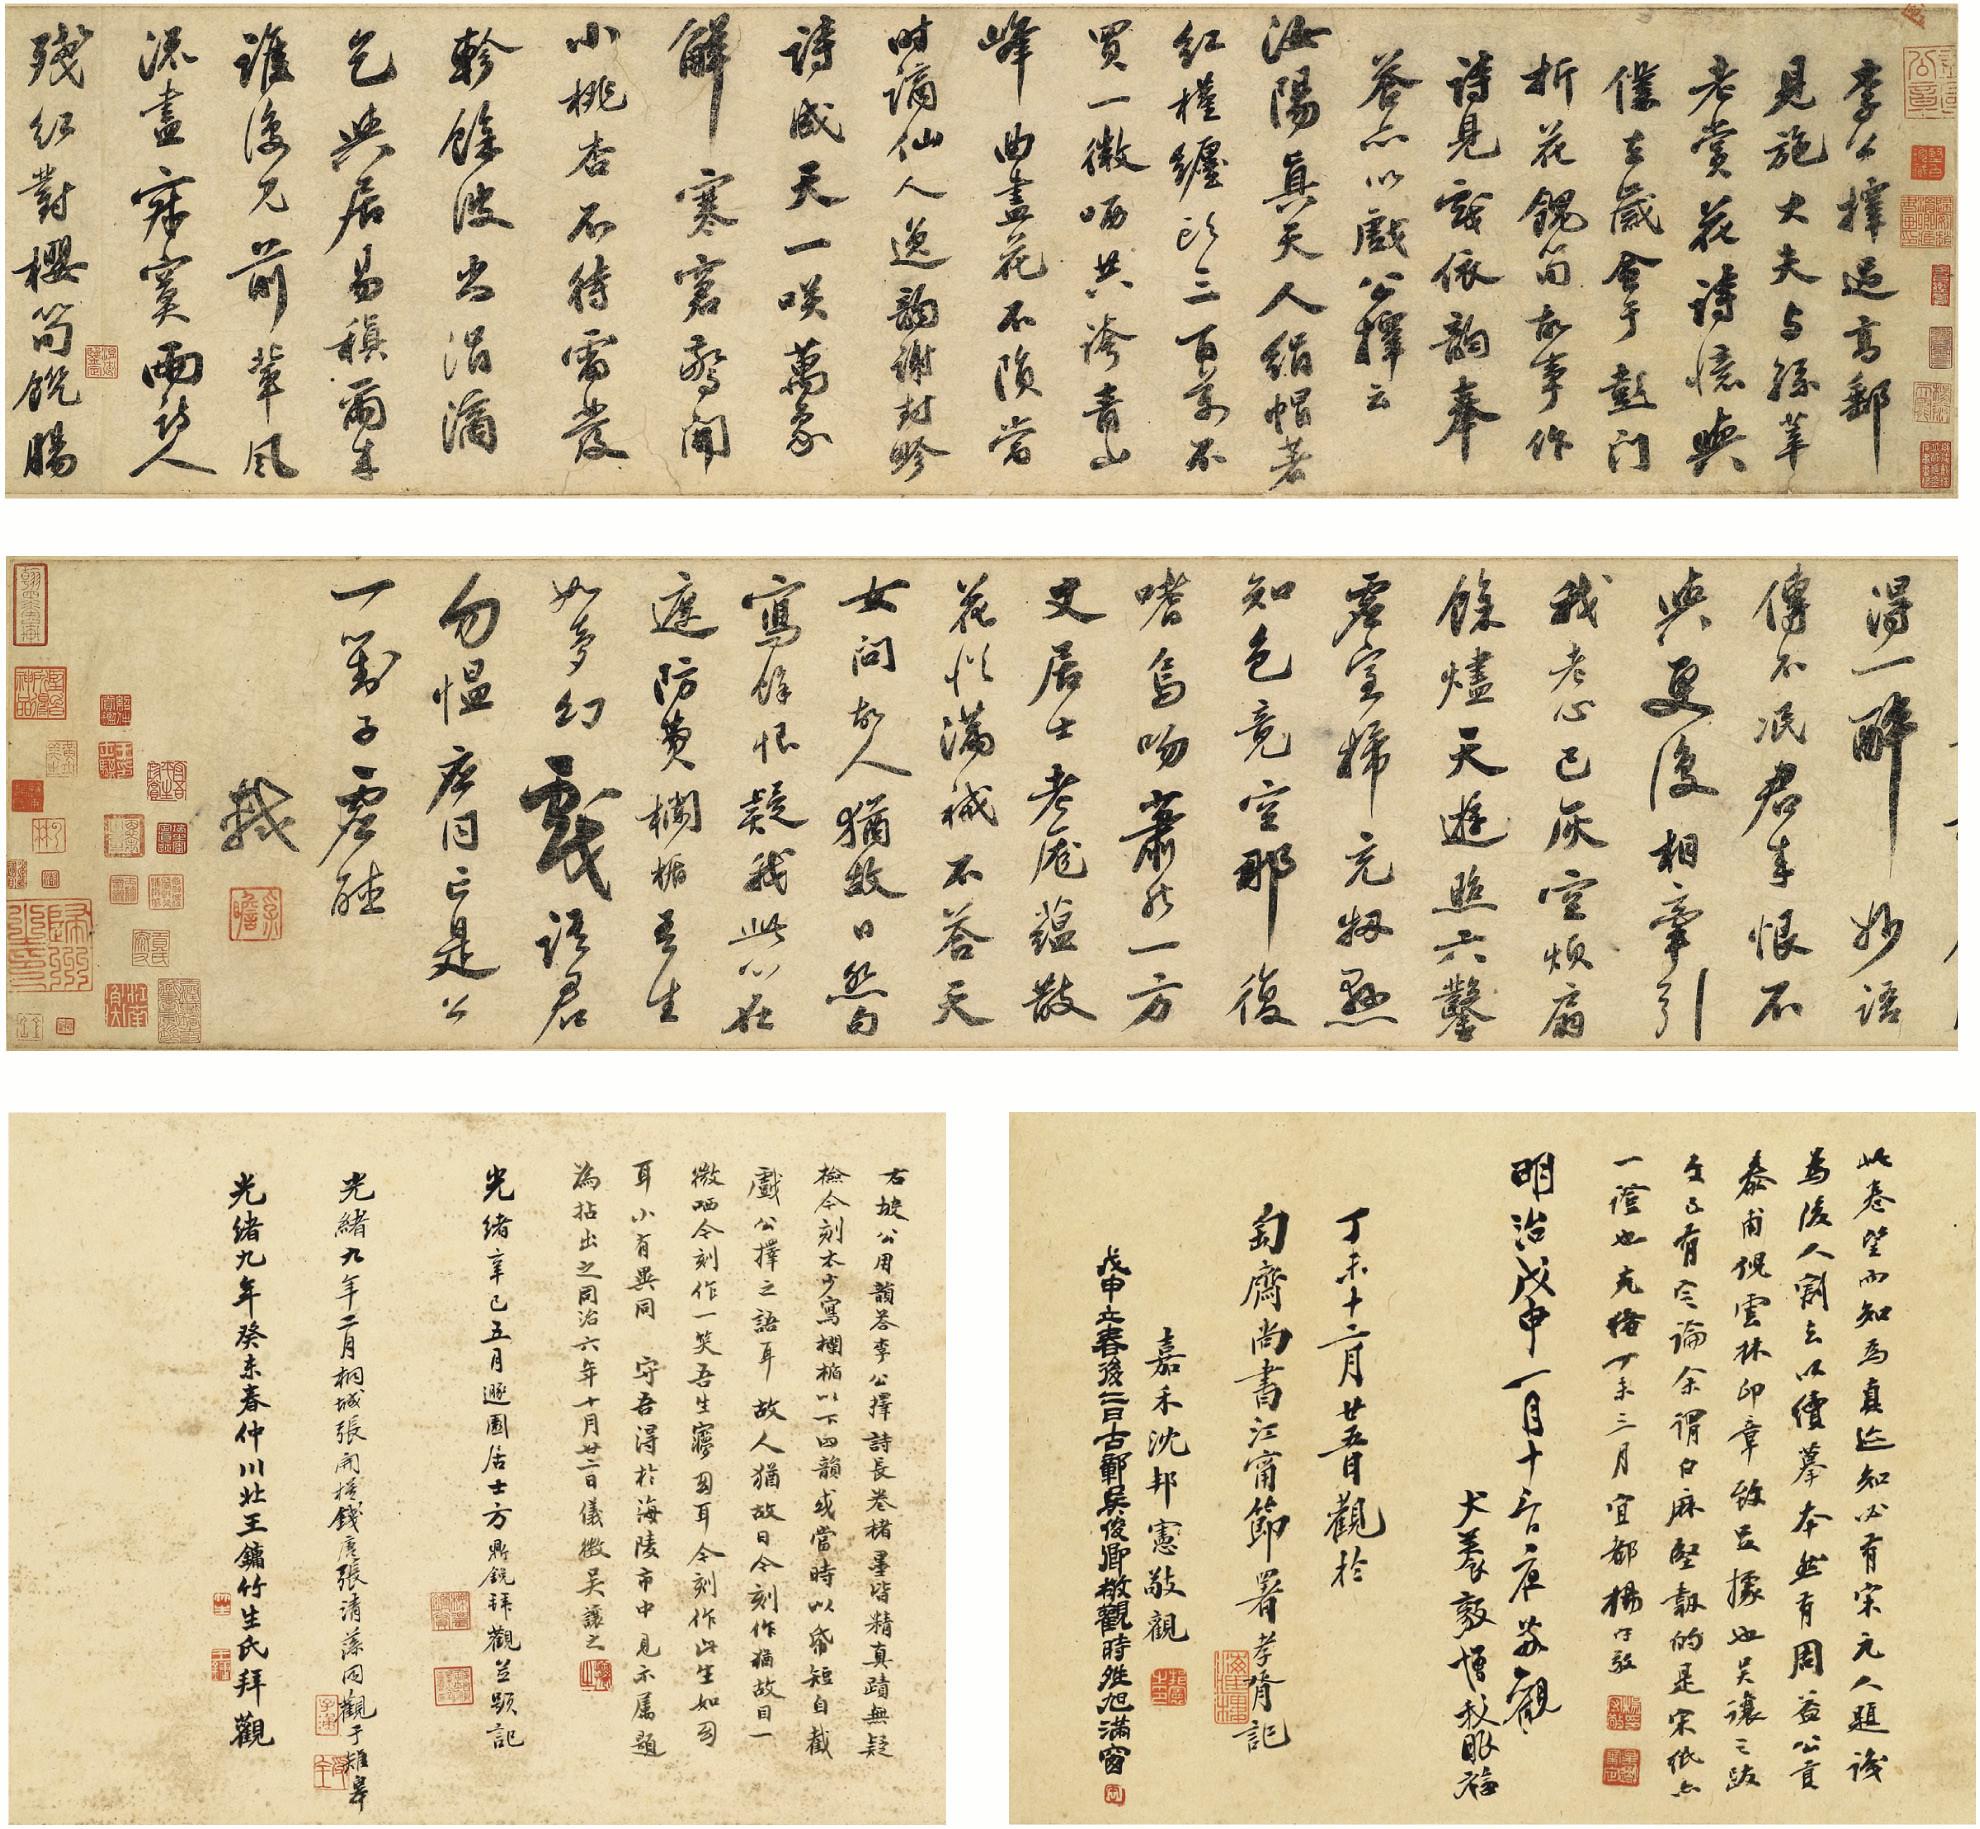 SU SHI (1036-1101, ATTRIBUTED